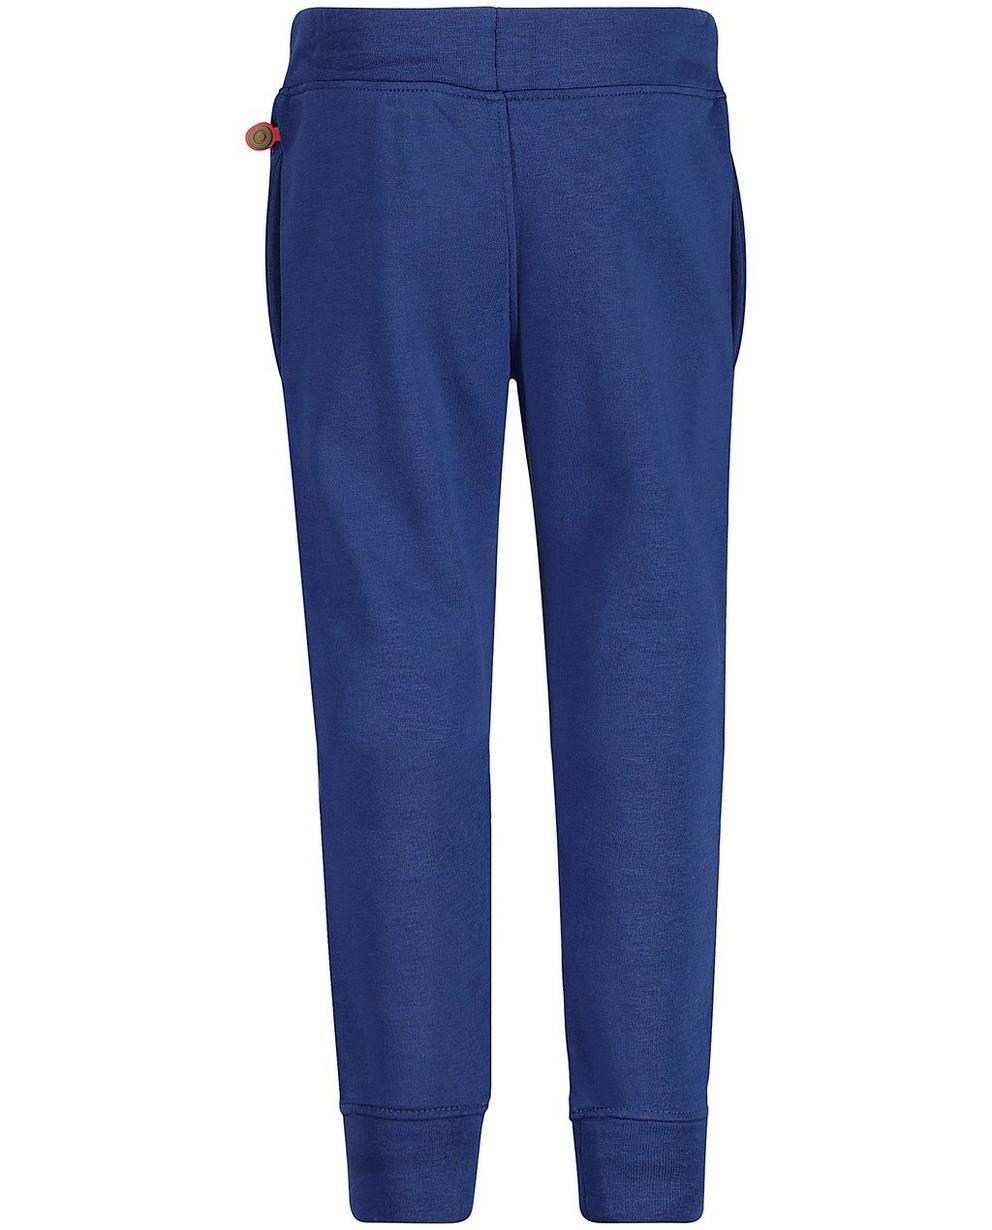 Broeken - Donkerblauwe sweatbroek